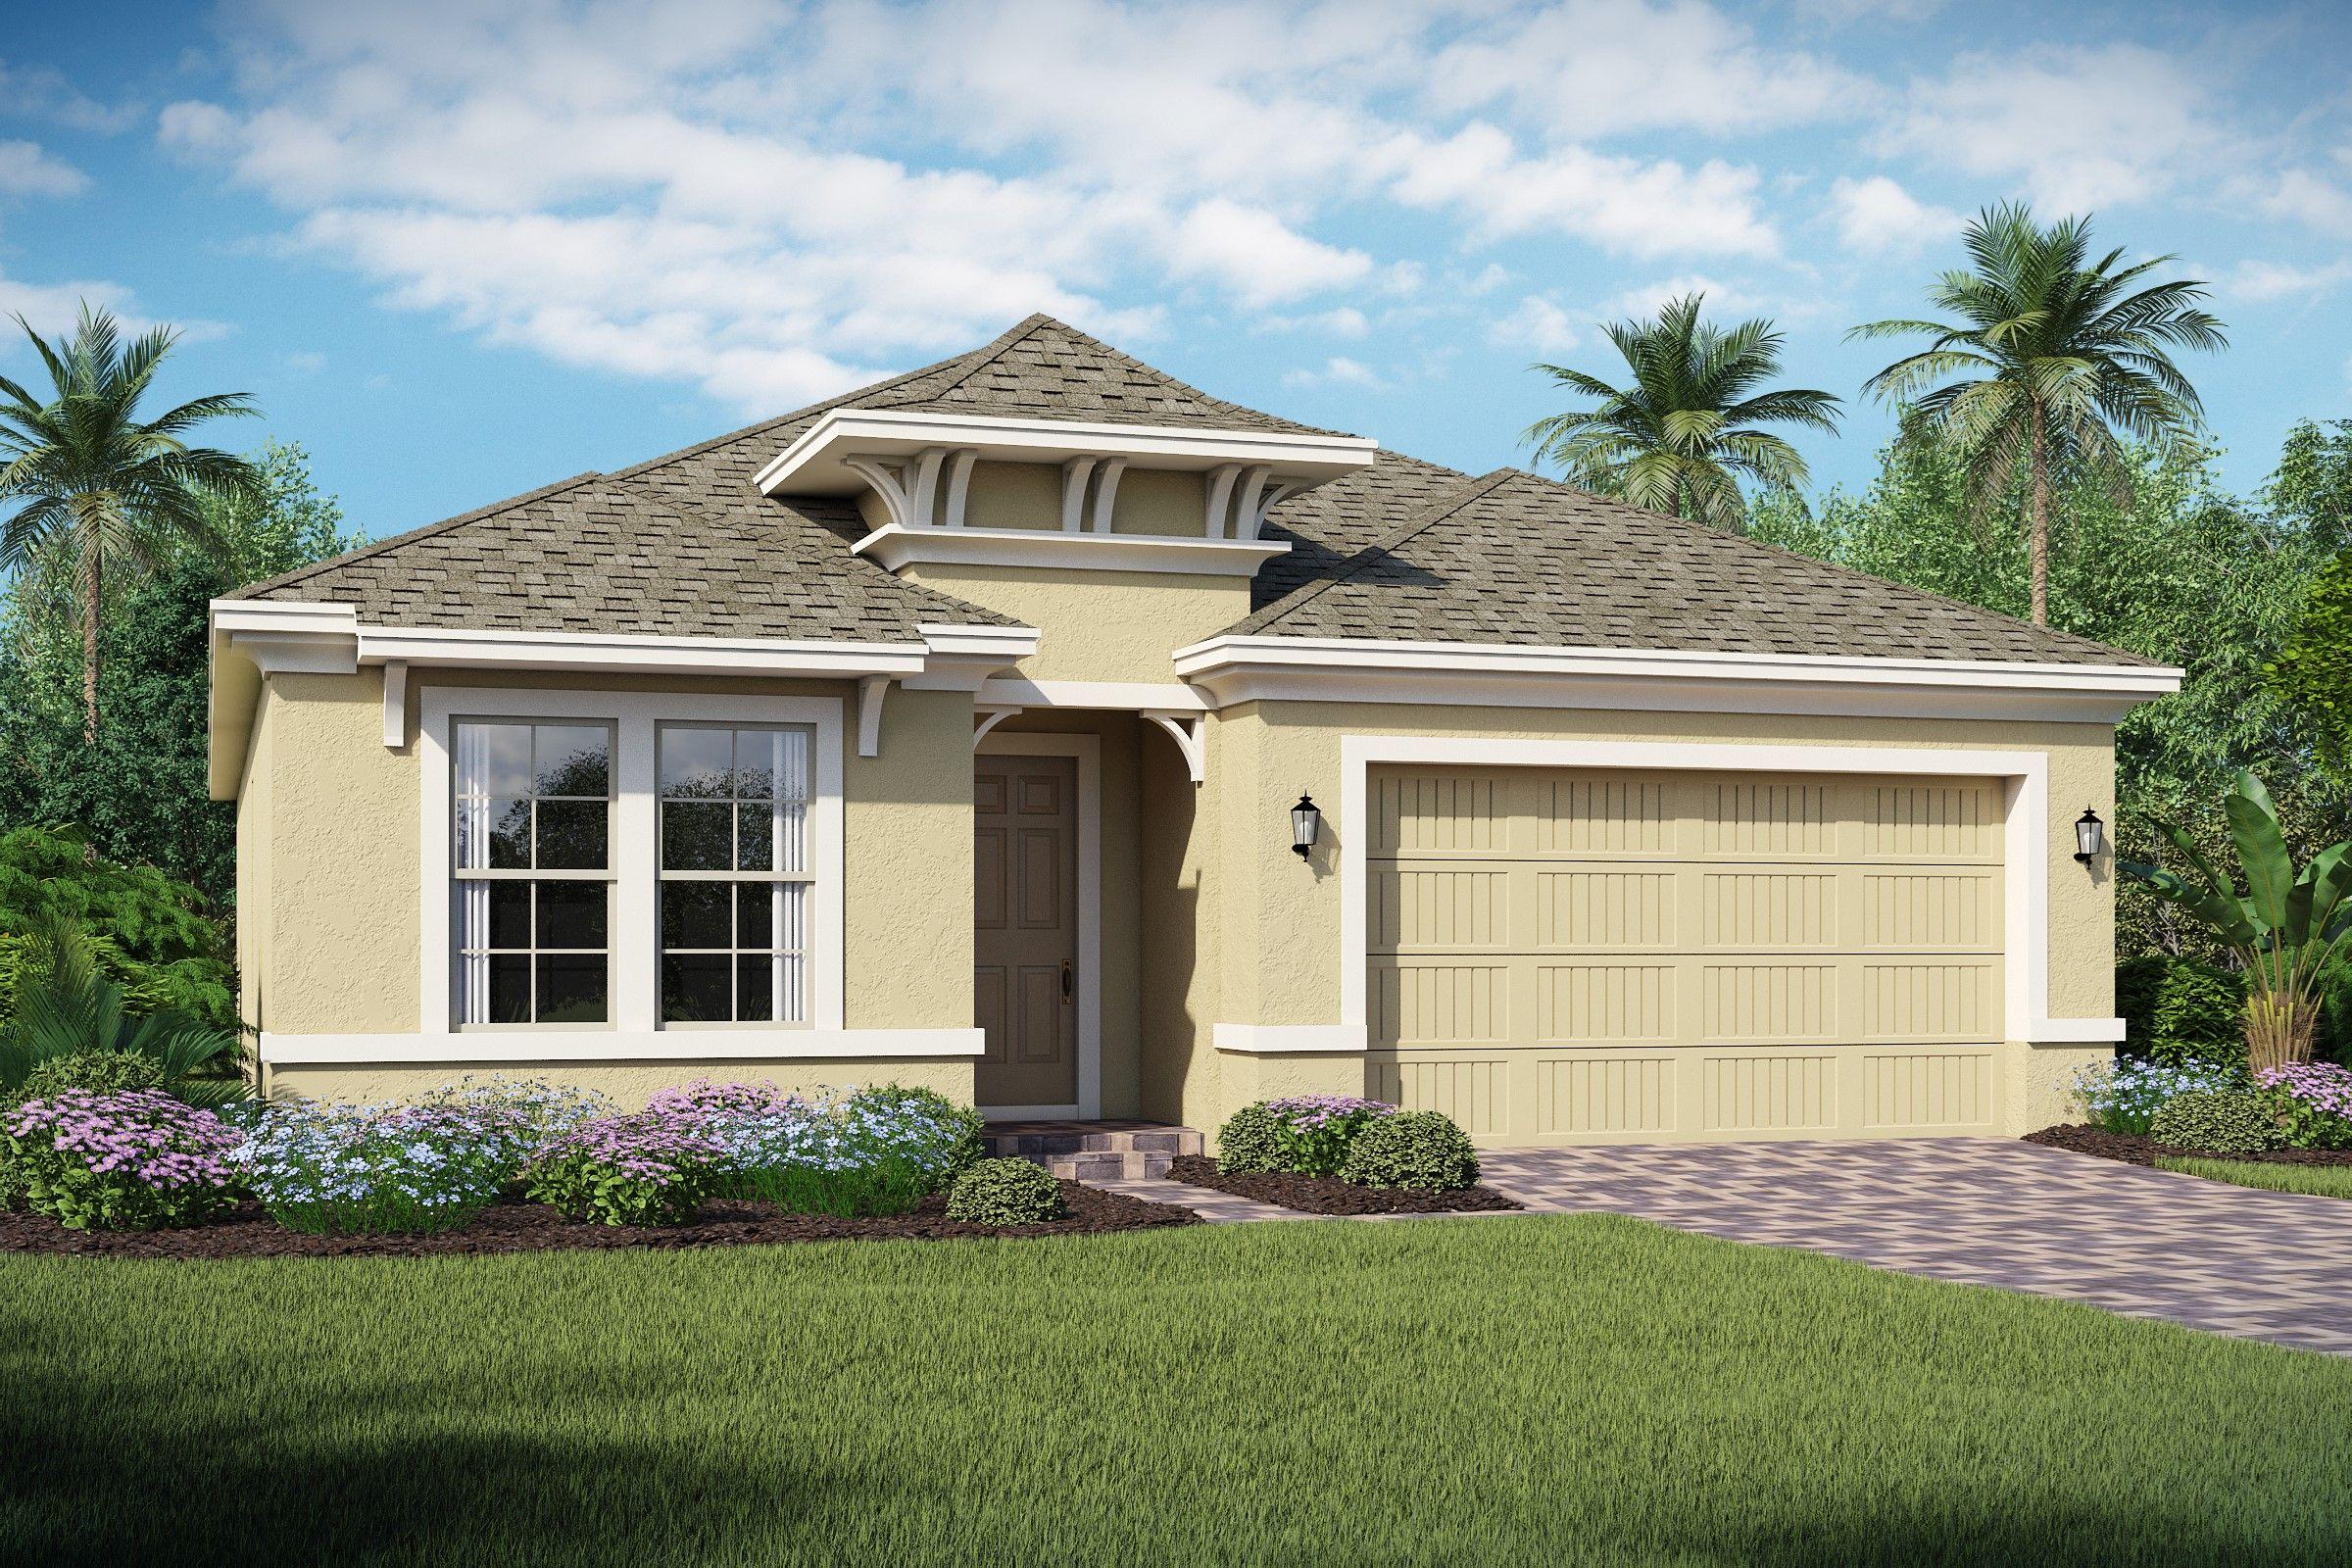 Single Family for Sale at Saint Lucia 4902 Tortuga Street, Homesite 167 St. Cloud, Florida 34771 United States